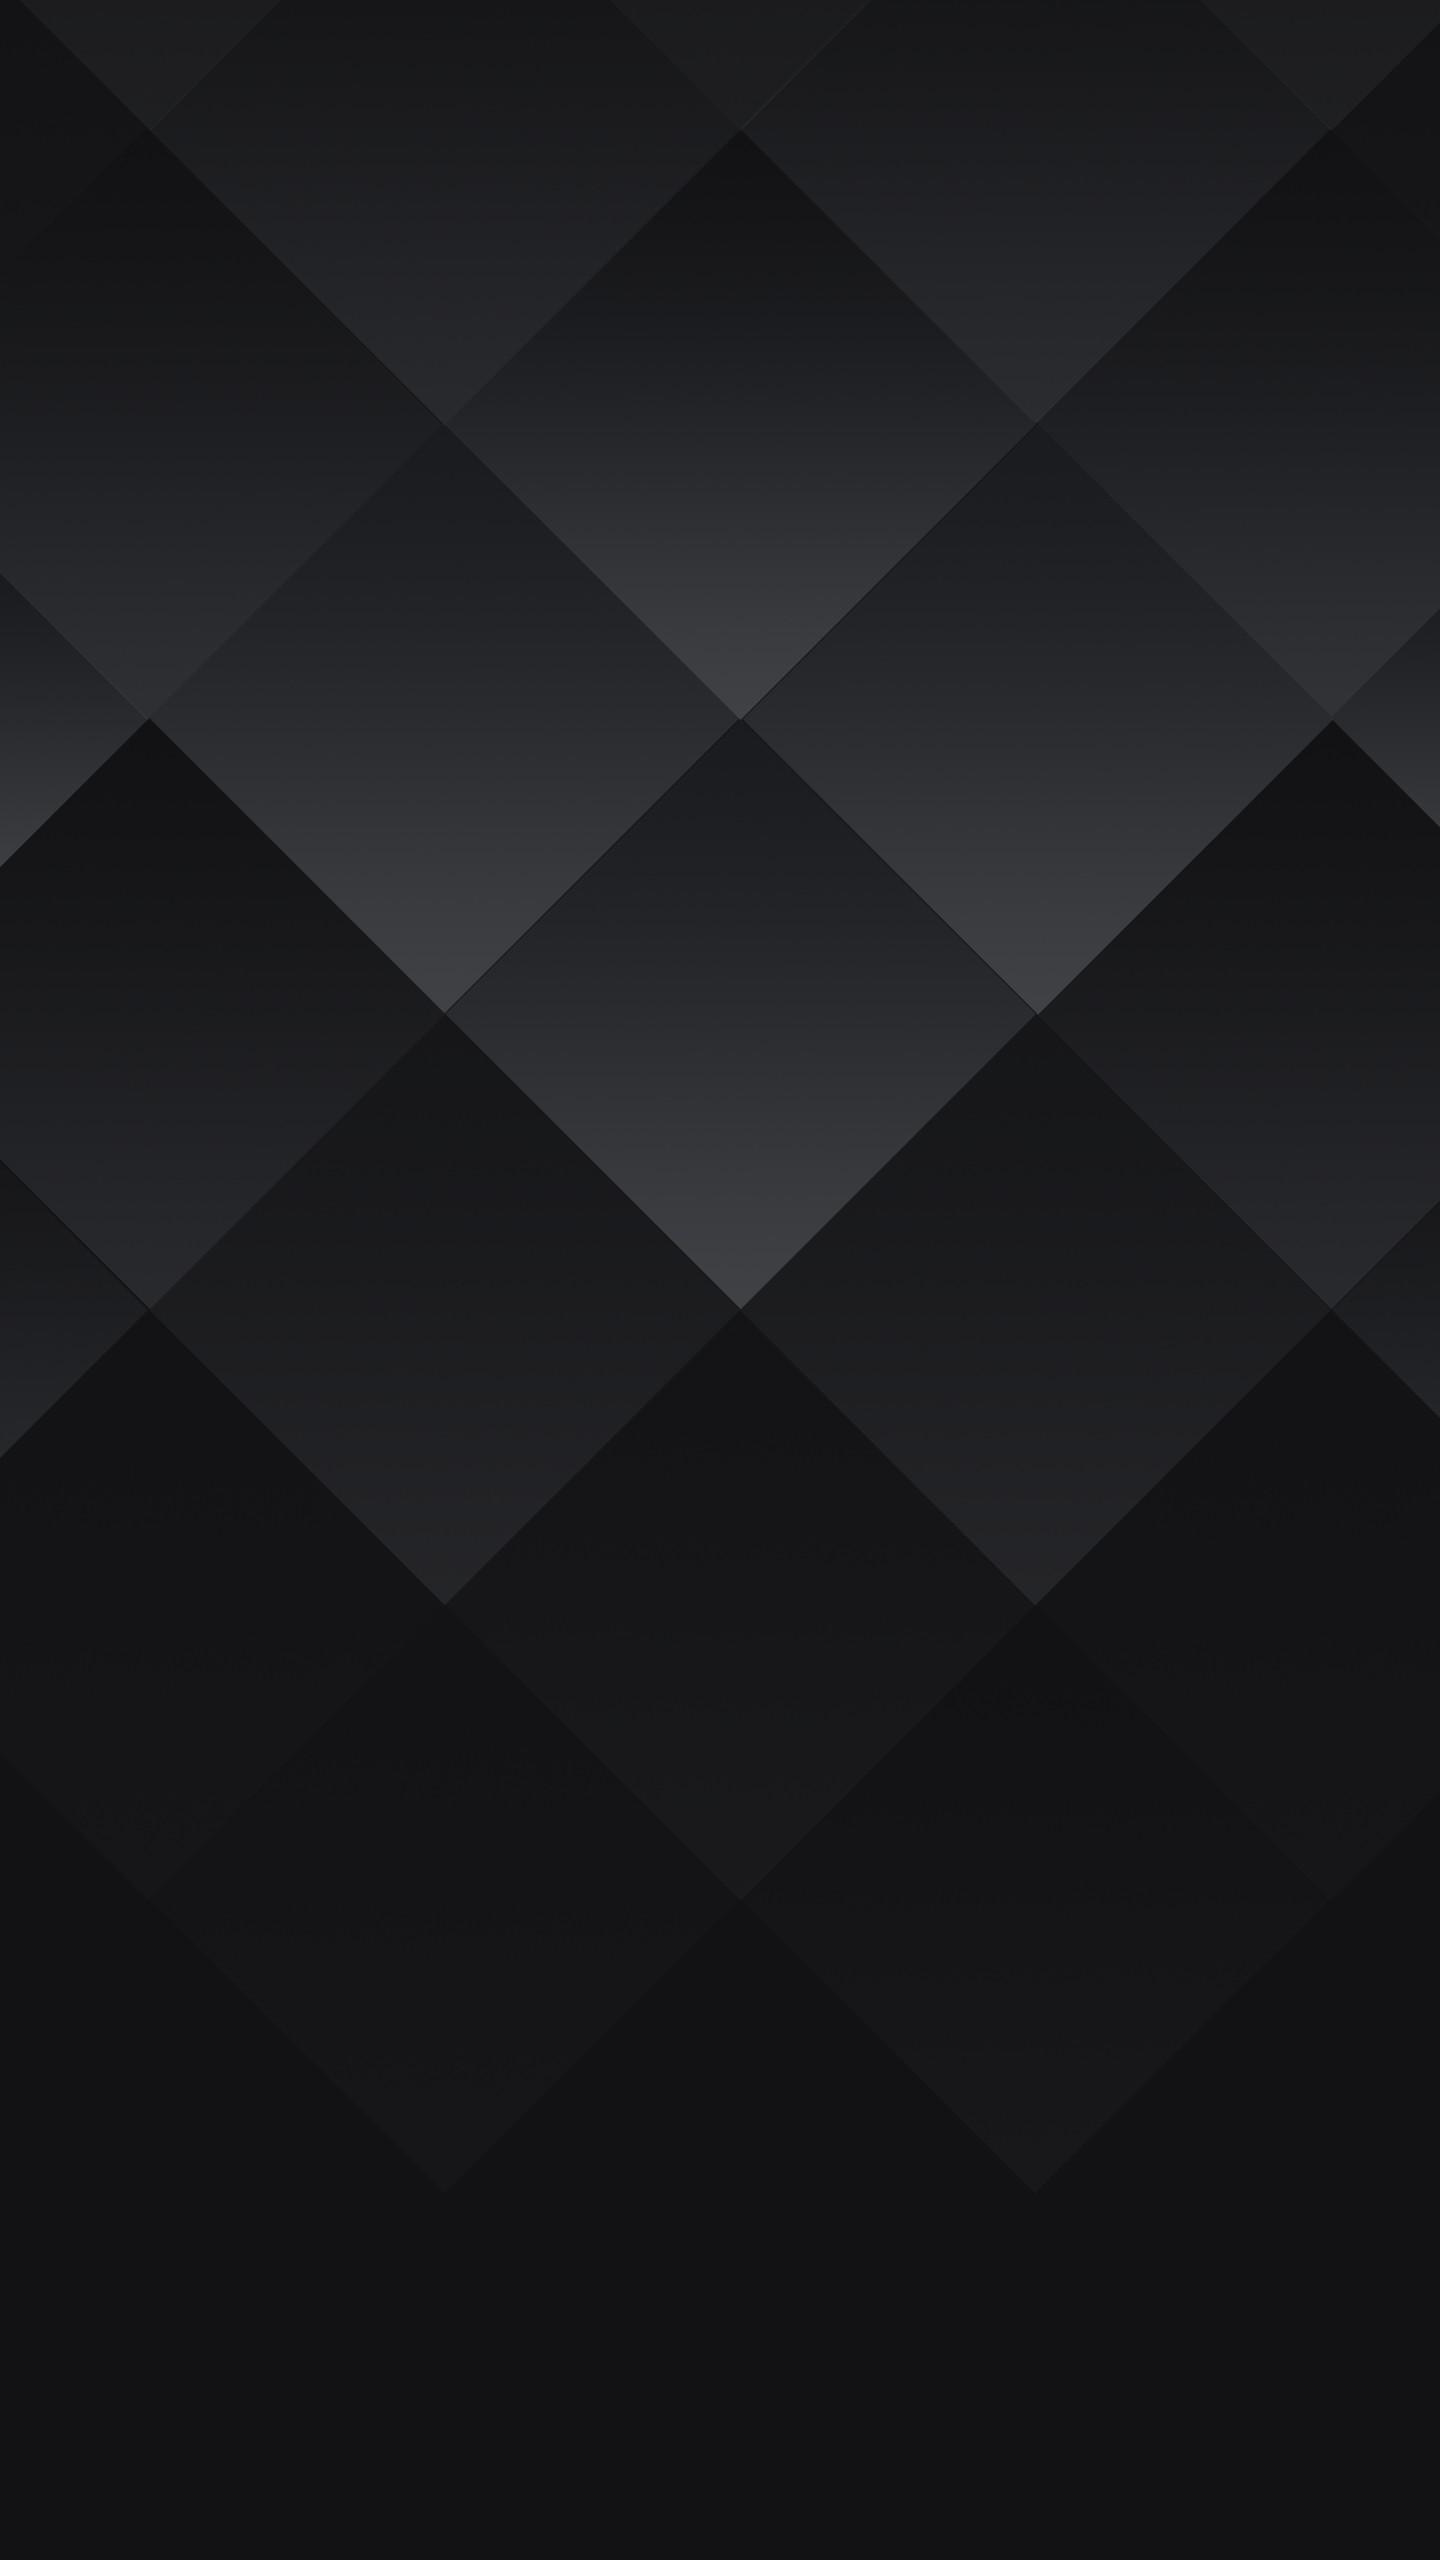 1920x1080 Wallpaper Black Diamond Red Lozenge Rhombus Dark 8b0000 000000 45A 180px 85px